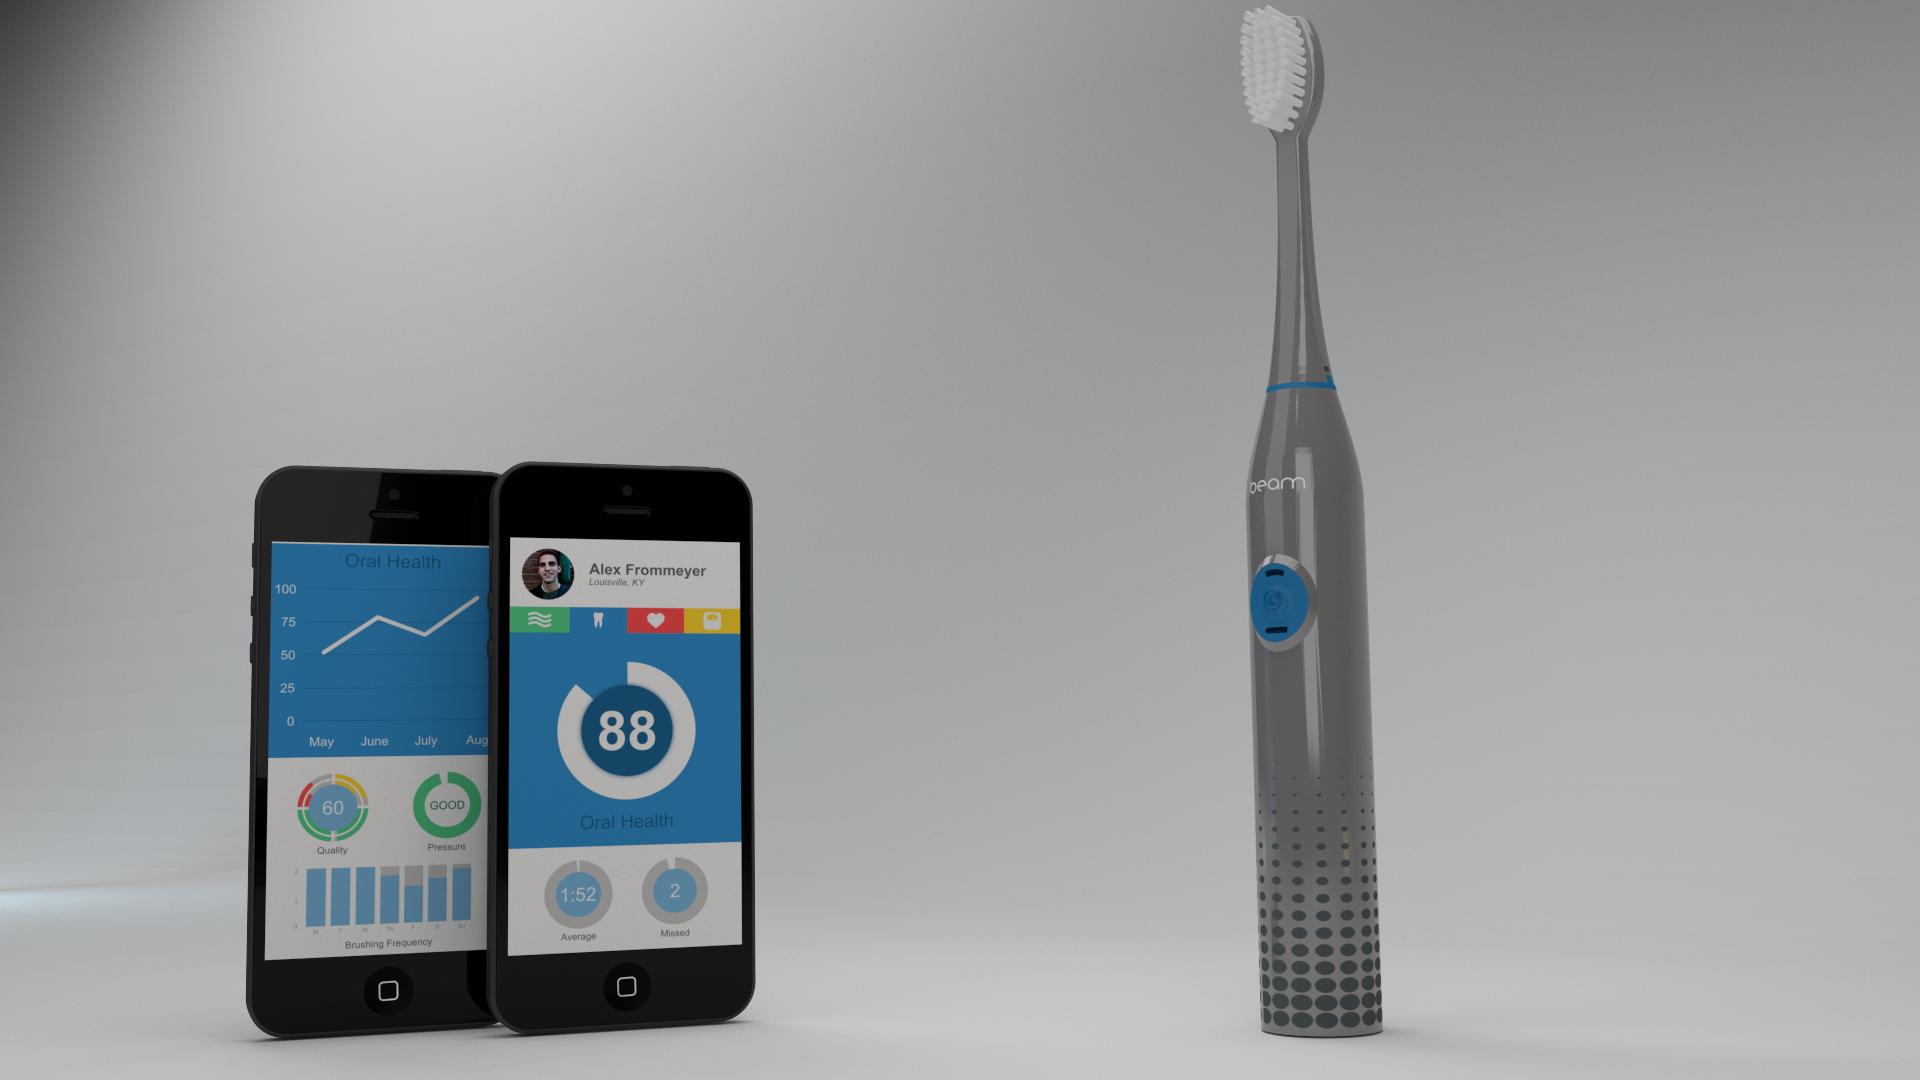 Smart Toothbrush Startup Beam Technologies Raises $5M in Series A Funding